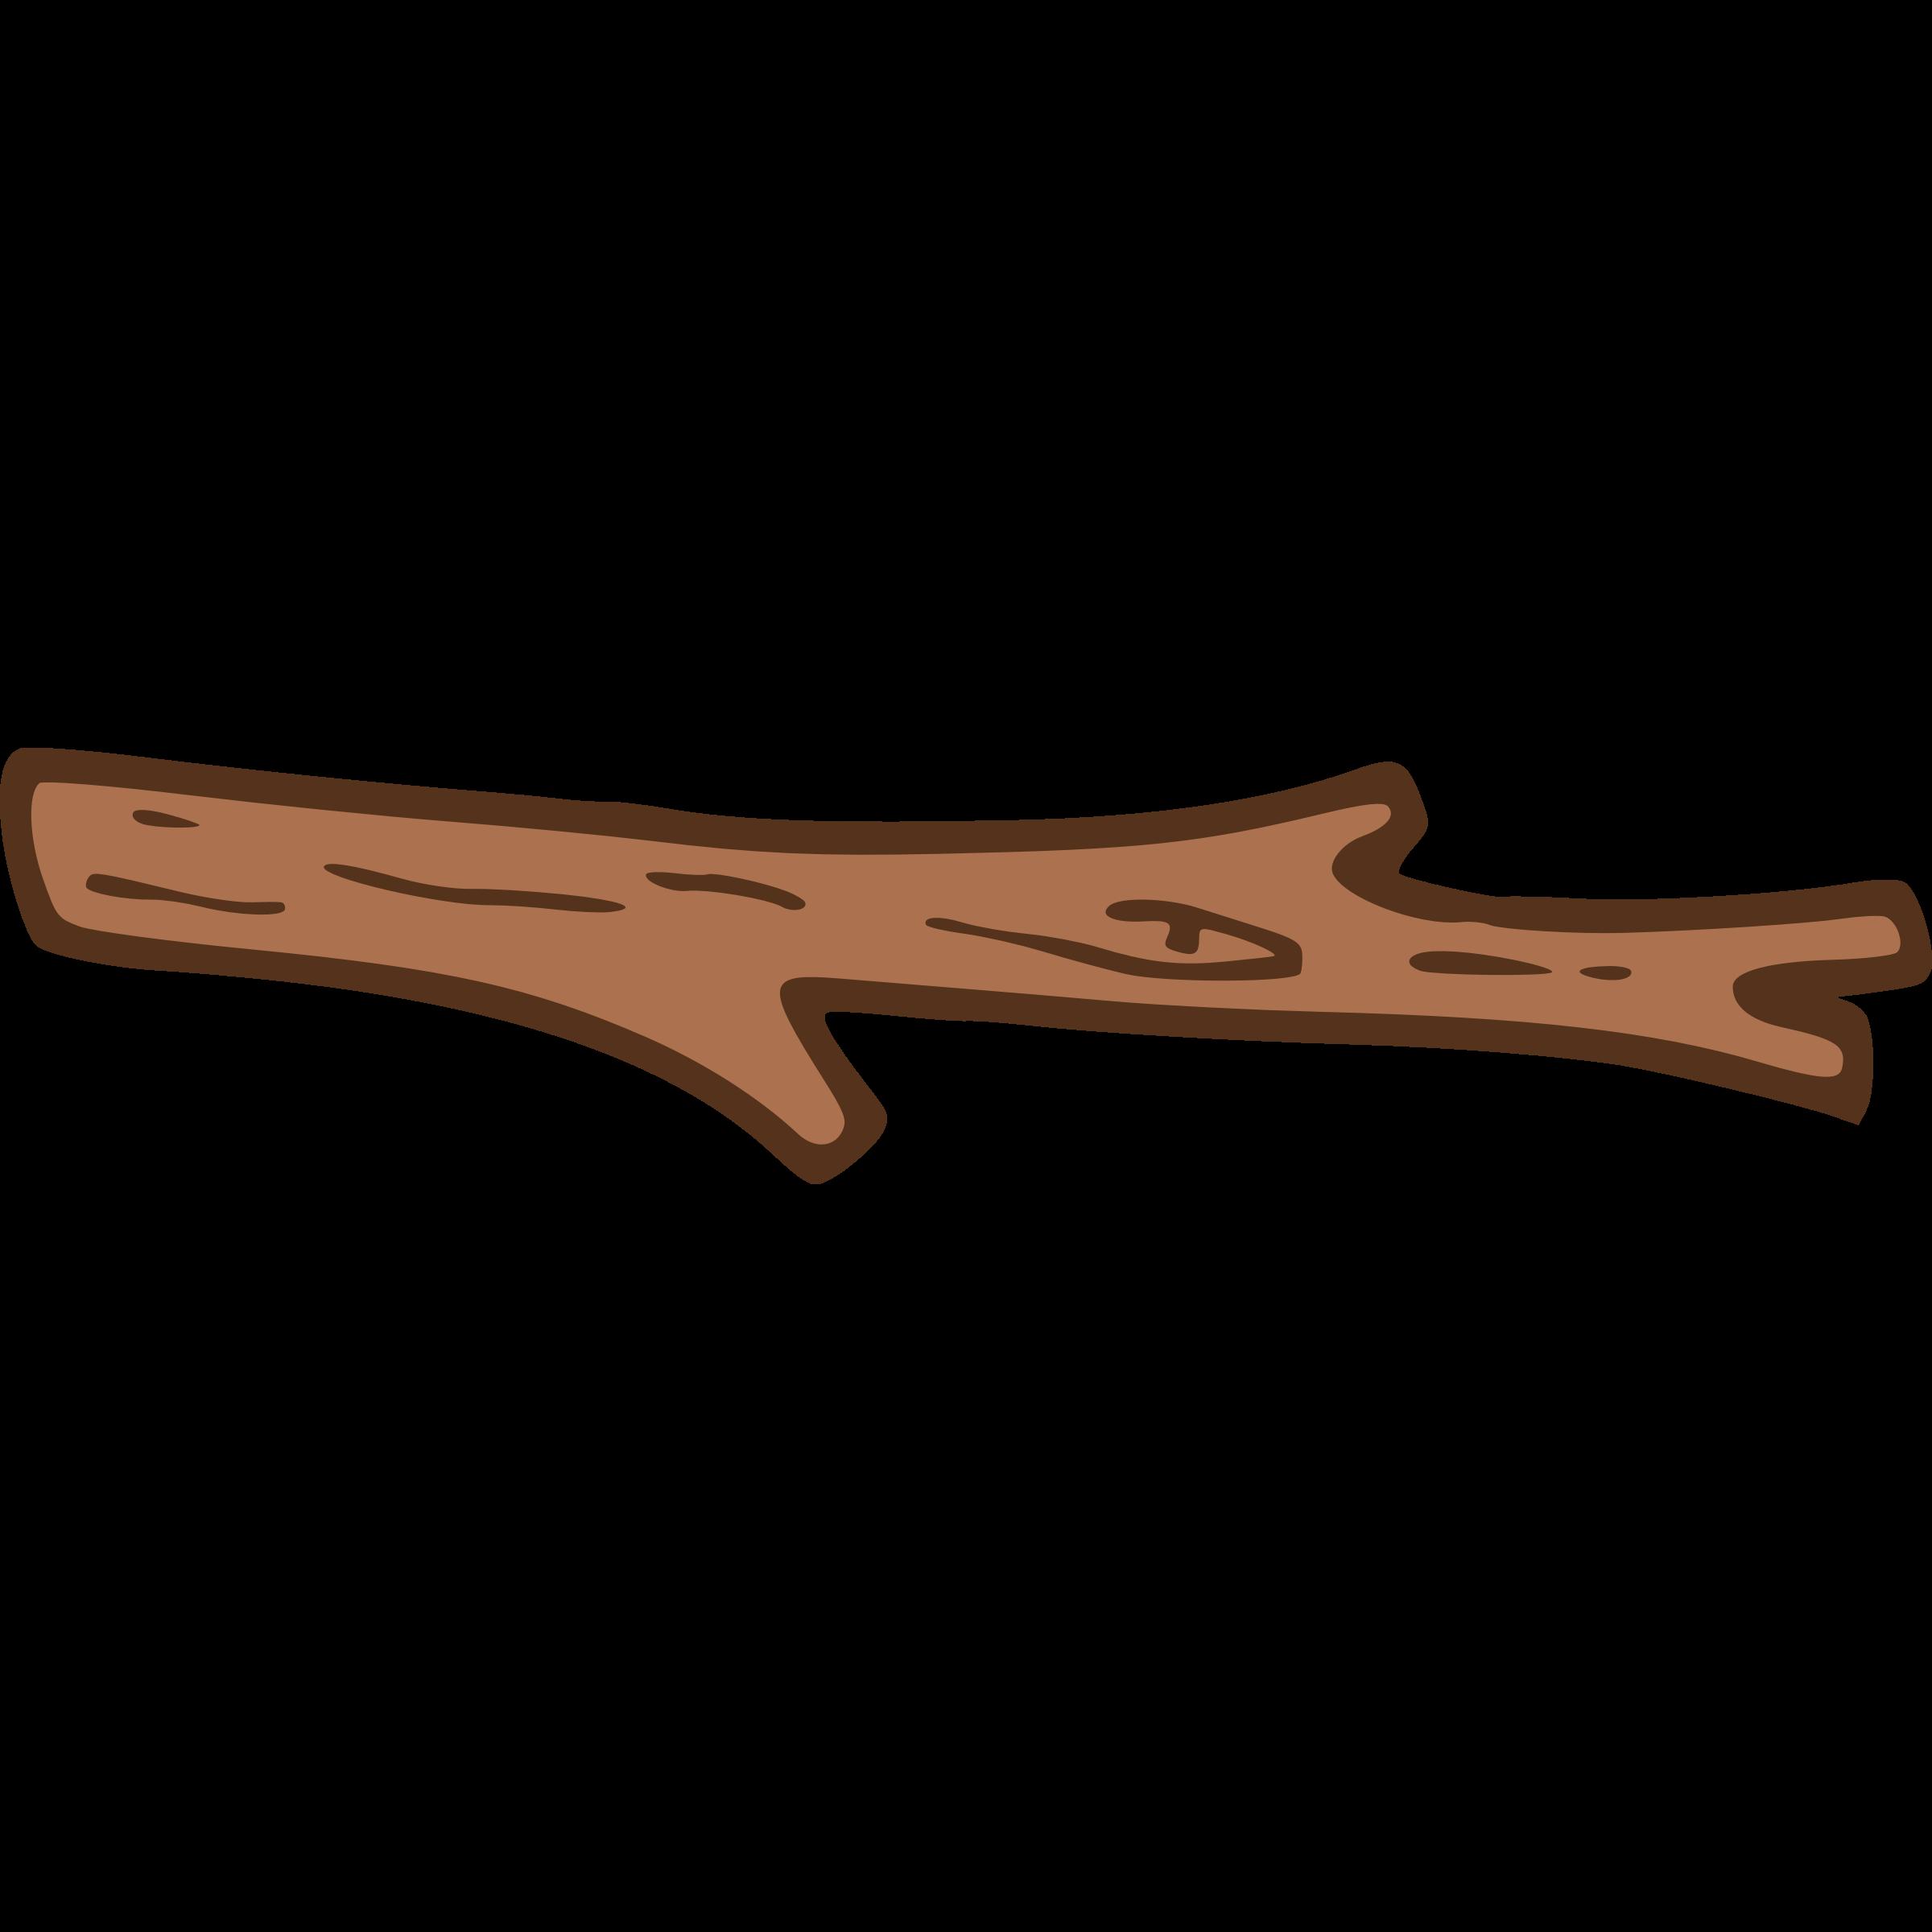 Wooden Stick Clipart-wooden stick clipart-19